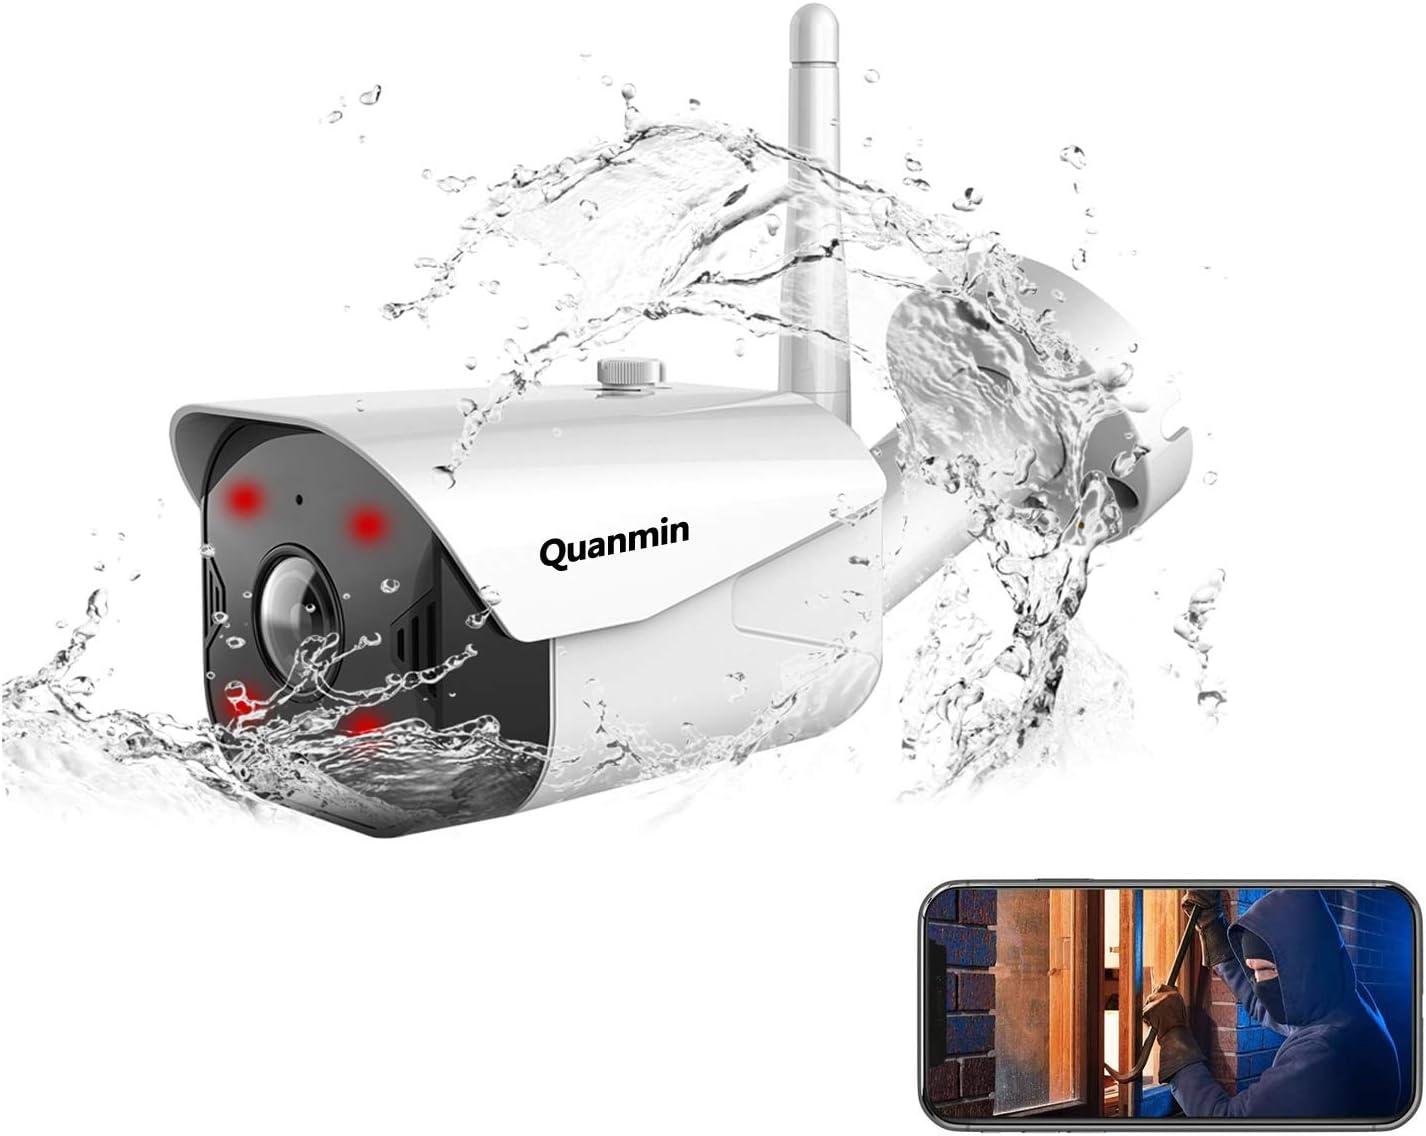 Quanmin Security Camera Smart Cloud Storage WiFi 1080P IP Camera Outdoor IP66 Waterproof Infrared Night Vision Two Way Audio Motion Detection Night Vision Work Alexa Home Surveillance CCTV Camera